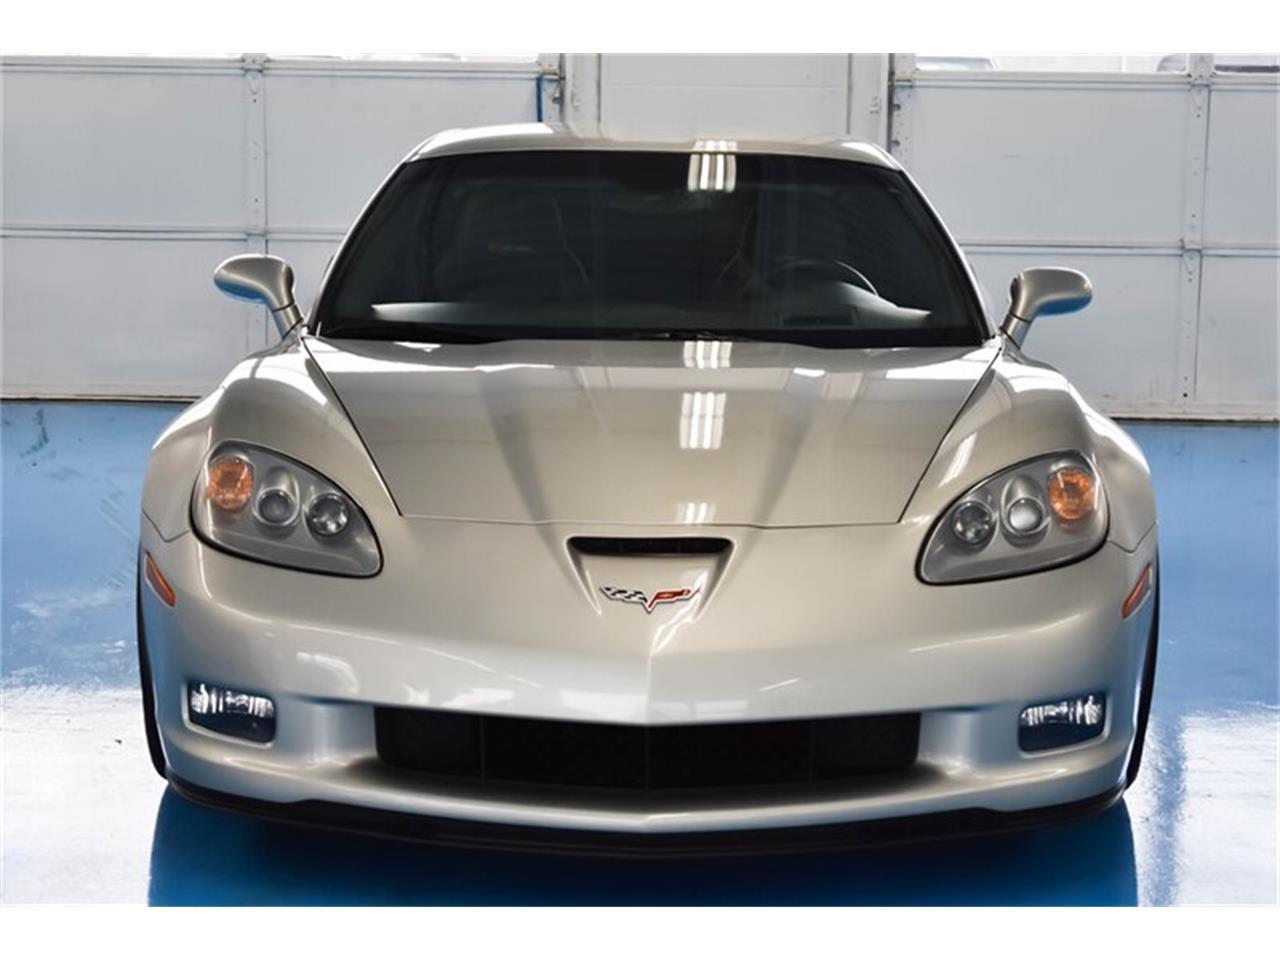 2008 Chevrolet Corvette Z06 (CC-1352656) for sale in Springfield, Ohio